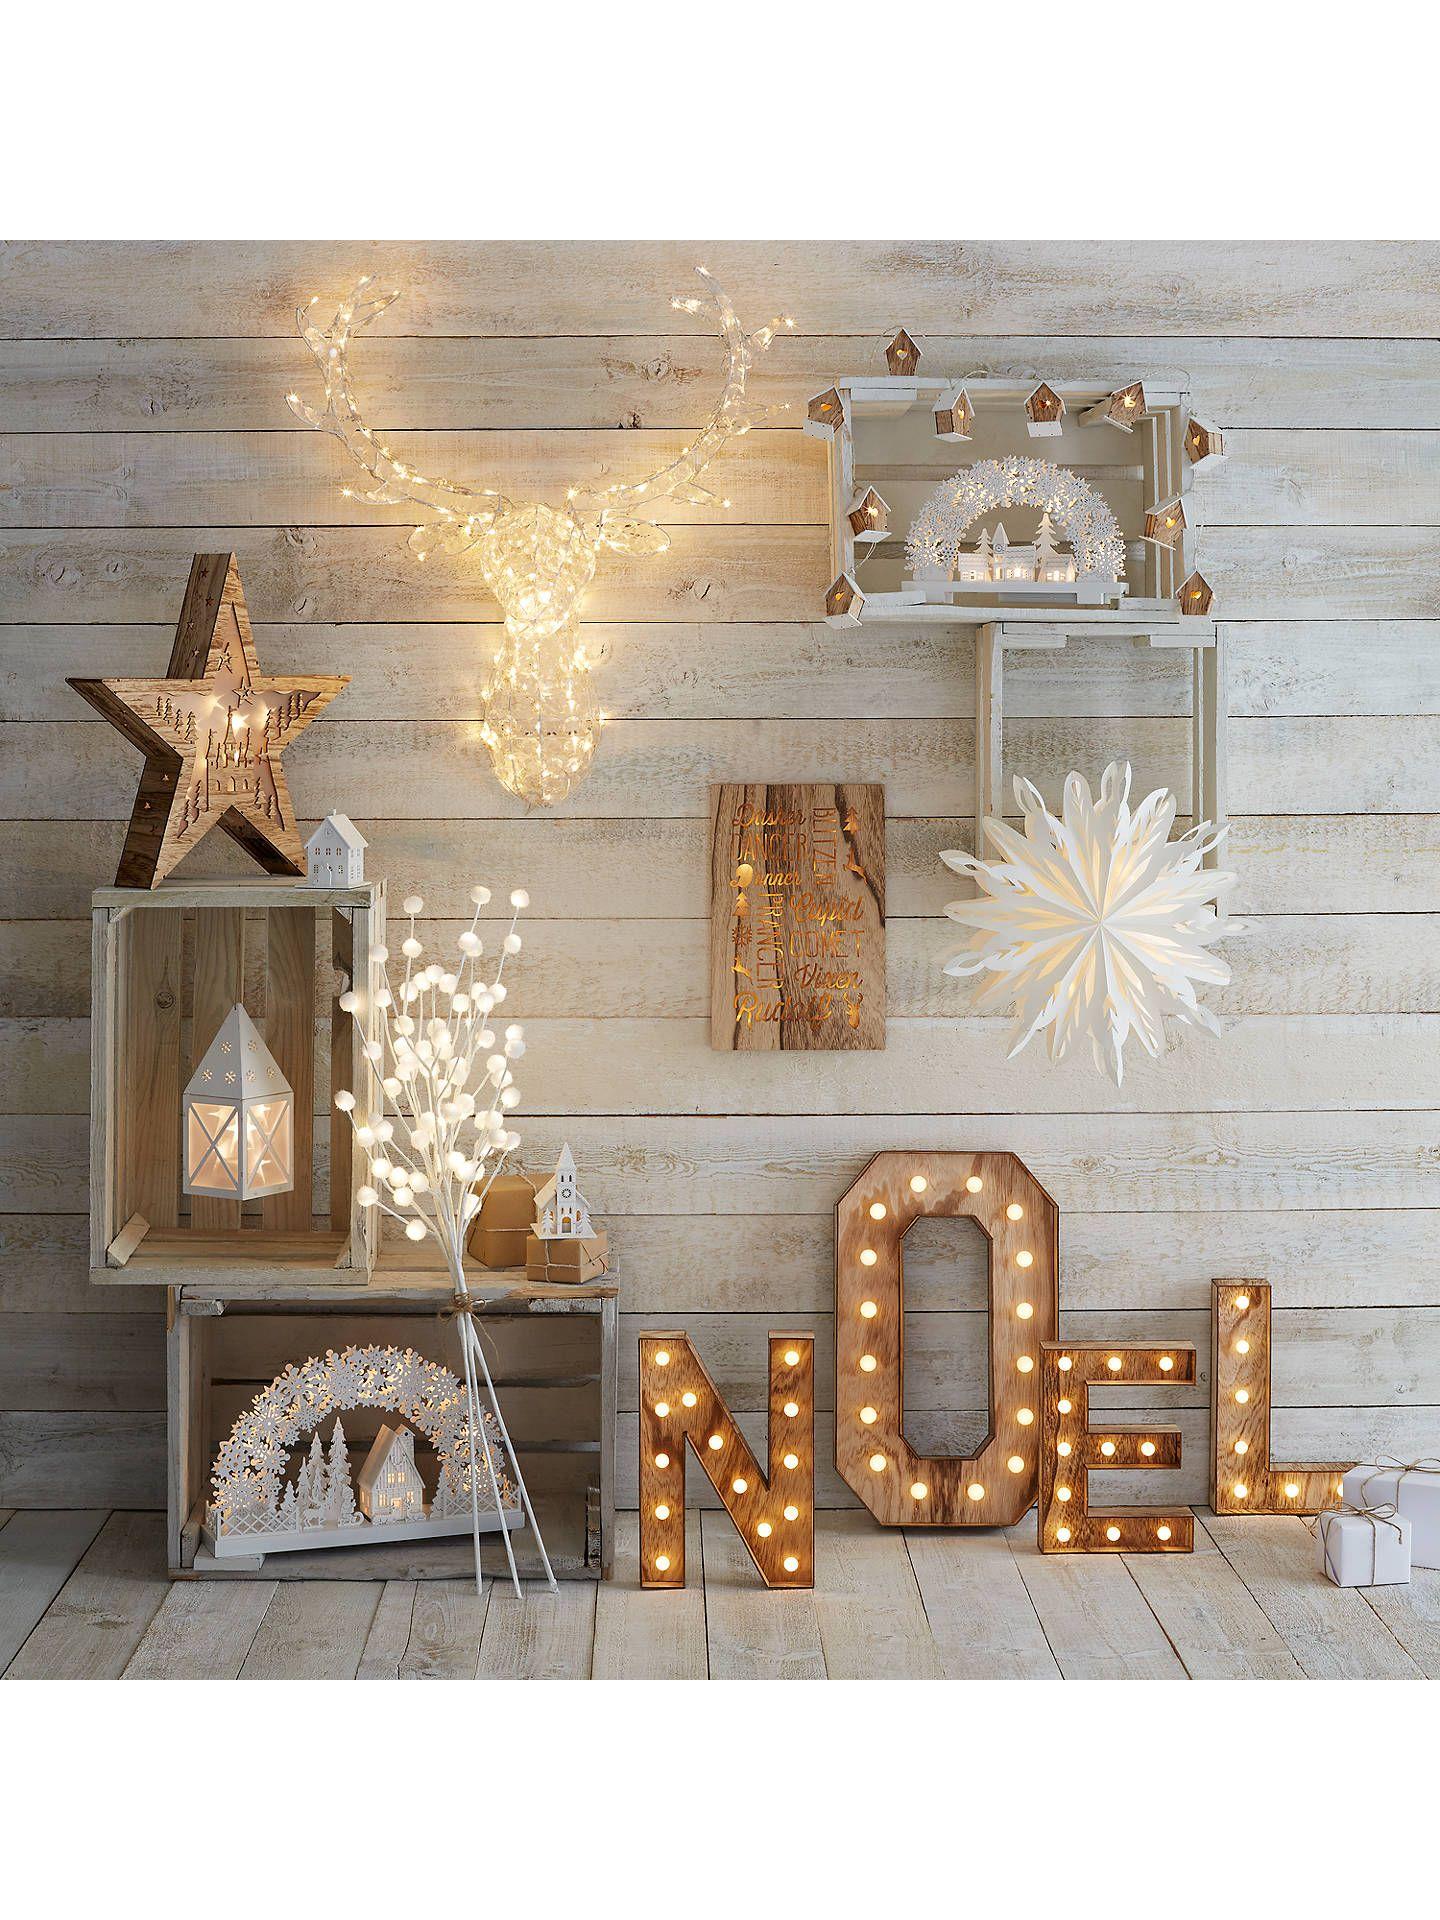 John Lewis Noel Christmas Light Sign Soft White Decorating With Christmas Lights Christmas Interiors Diy Christmas Lights